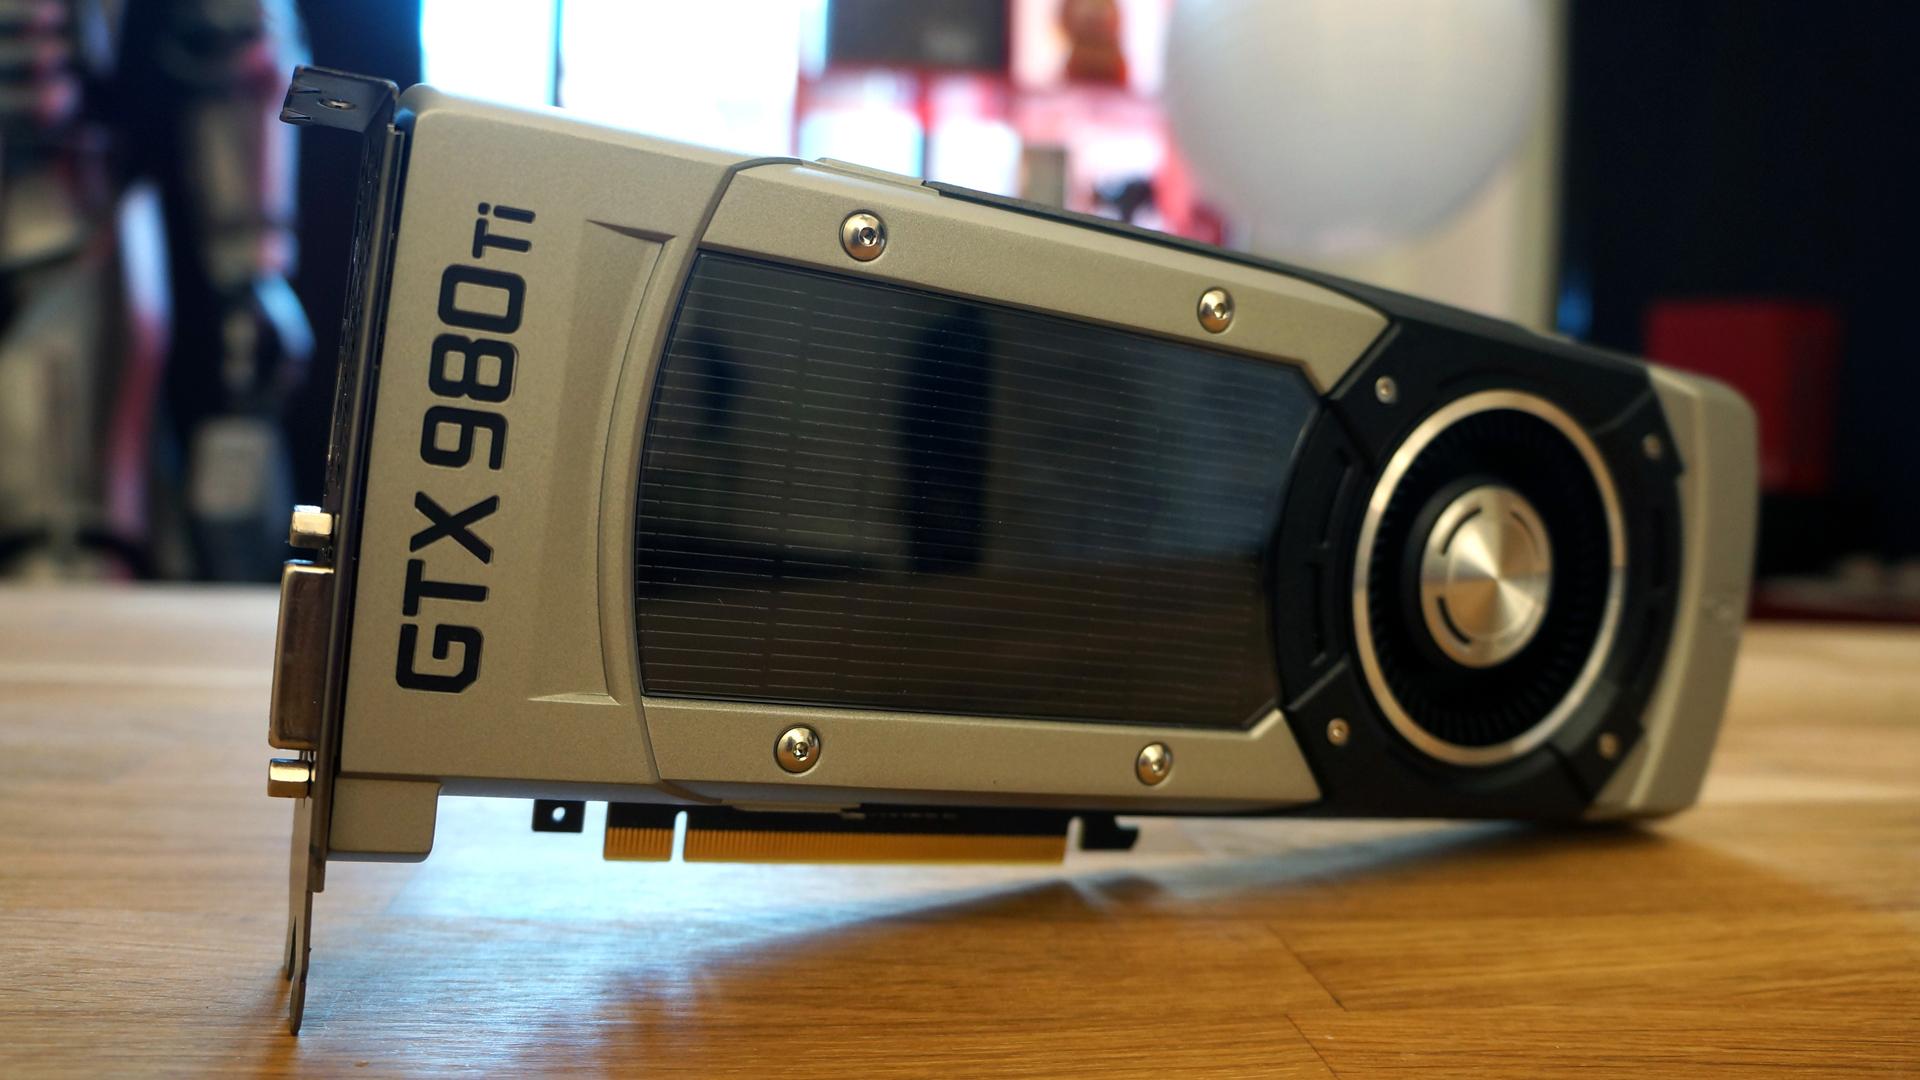 nvidia-gtx-980-ti